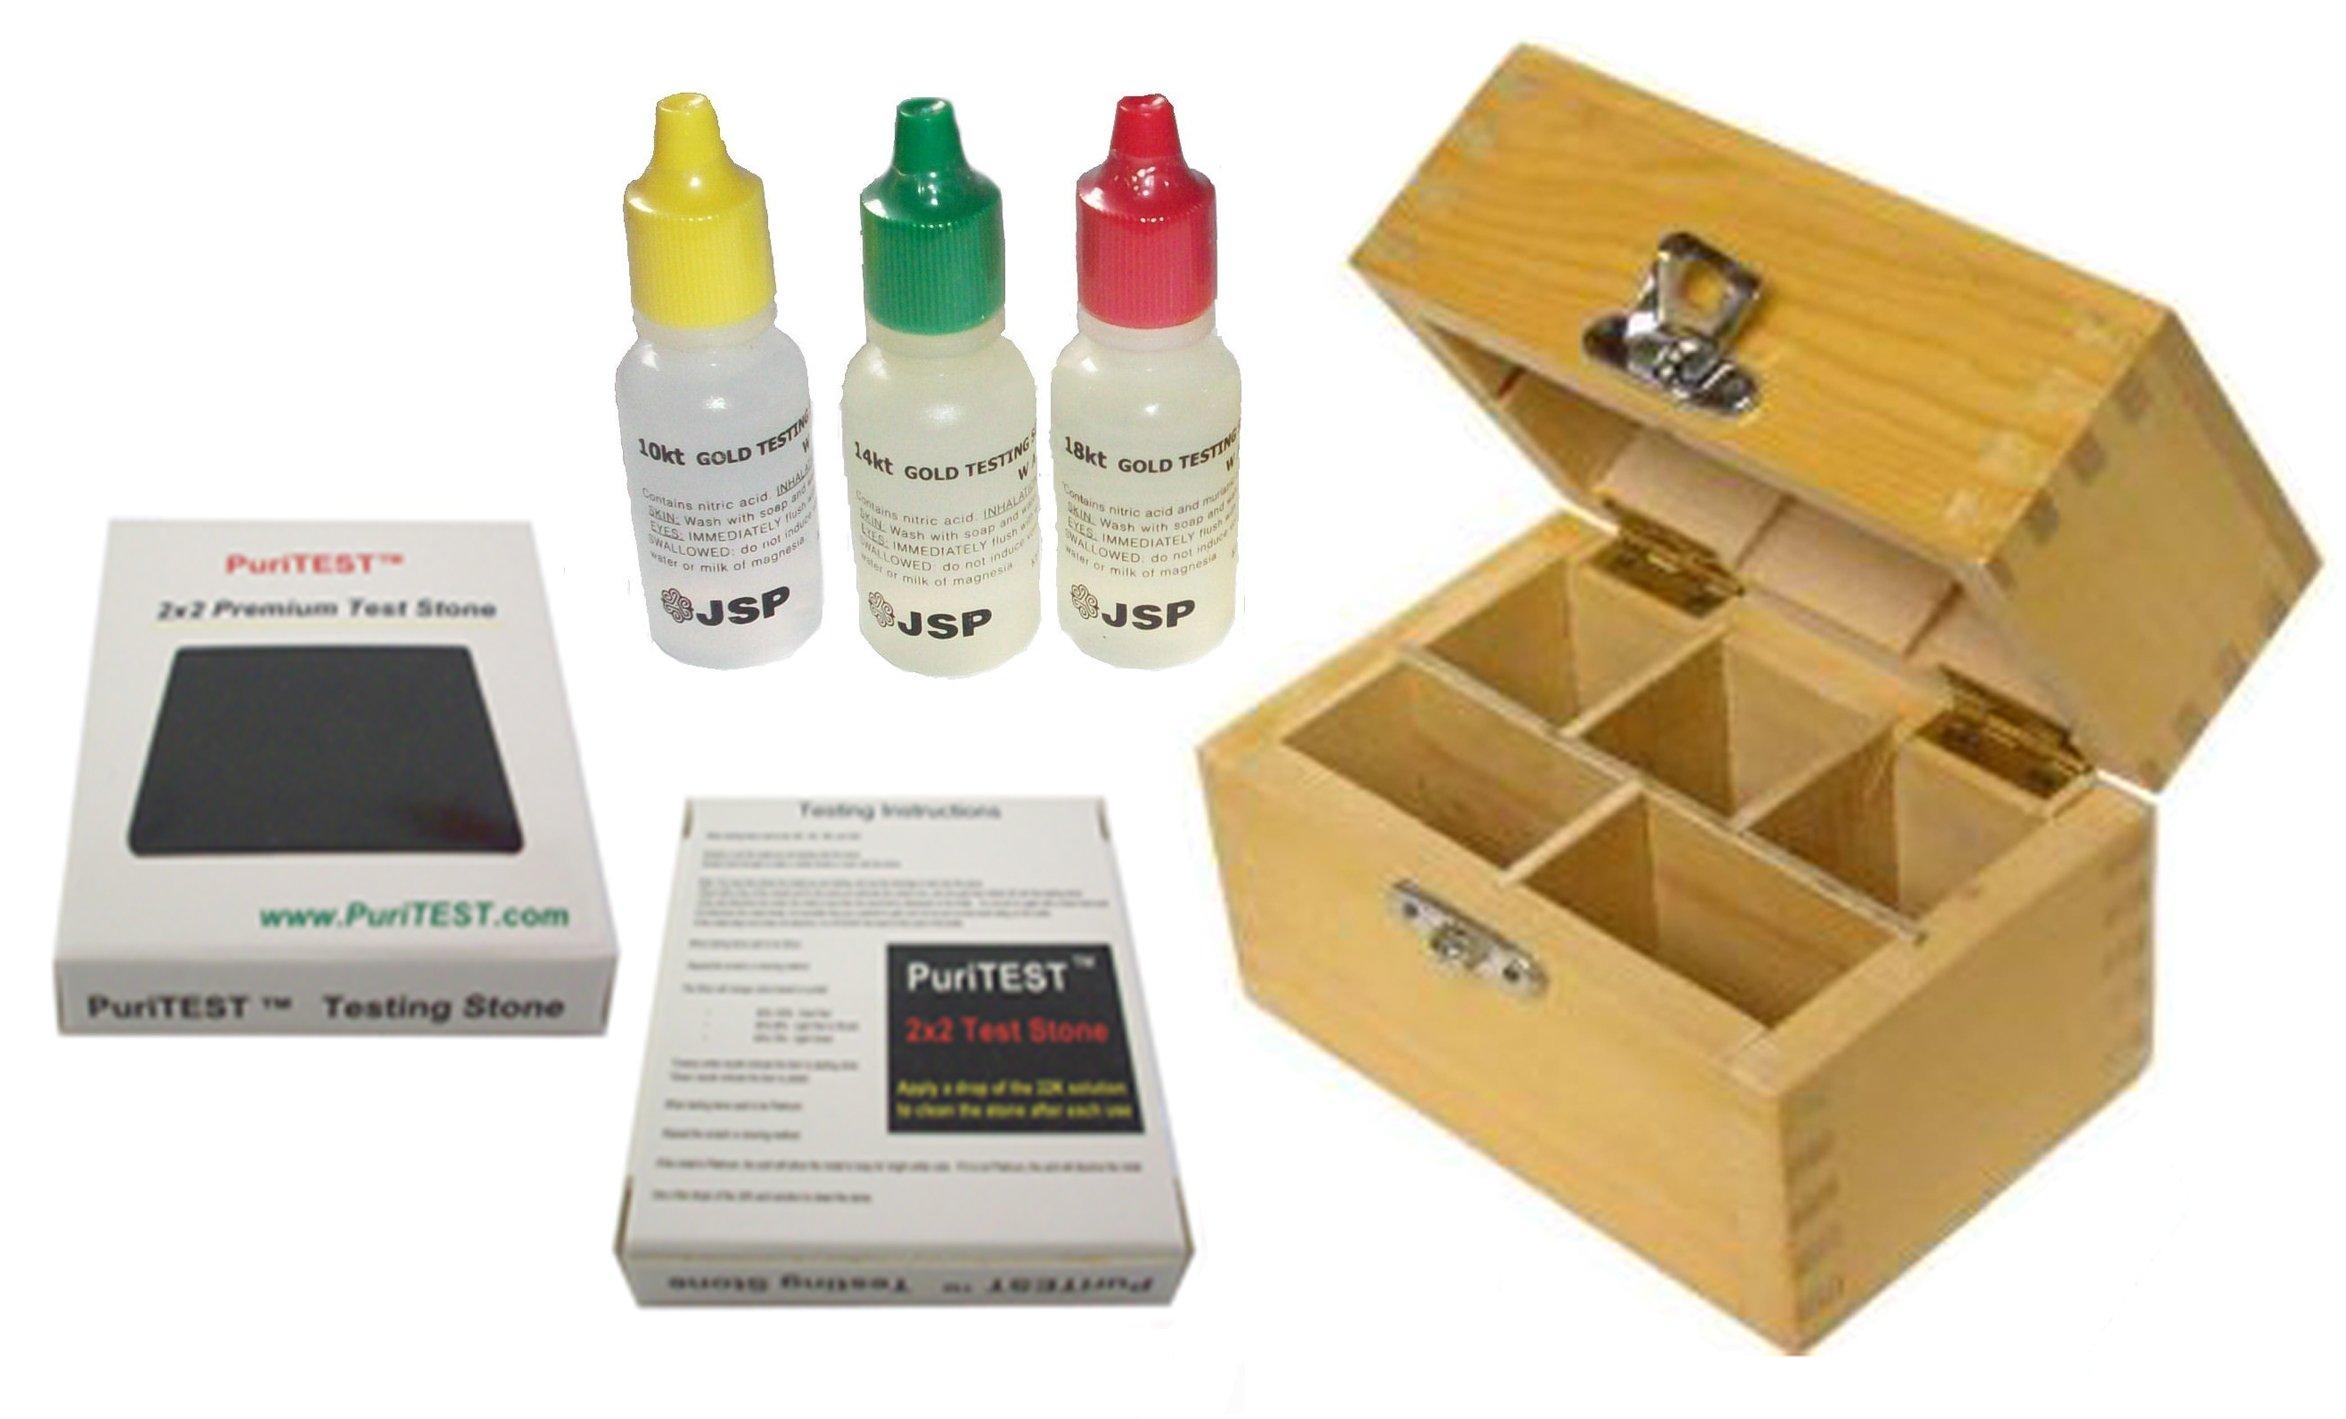 "JSP 10k/14k/18k Gold Test Acid Solutions Tester Kit Detect Metals Scrap Jewelry + Wooden Box + PRO 2x2"" Testing Stone"